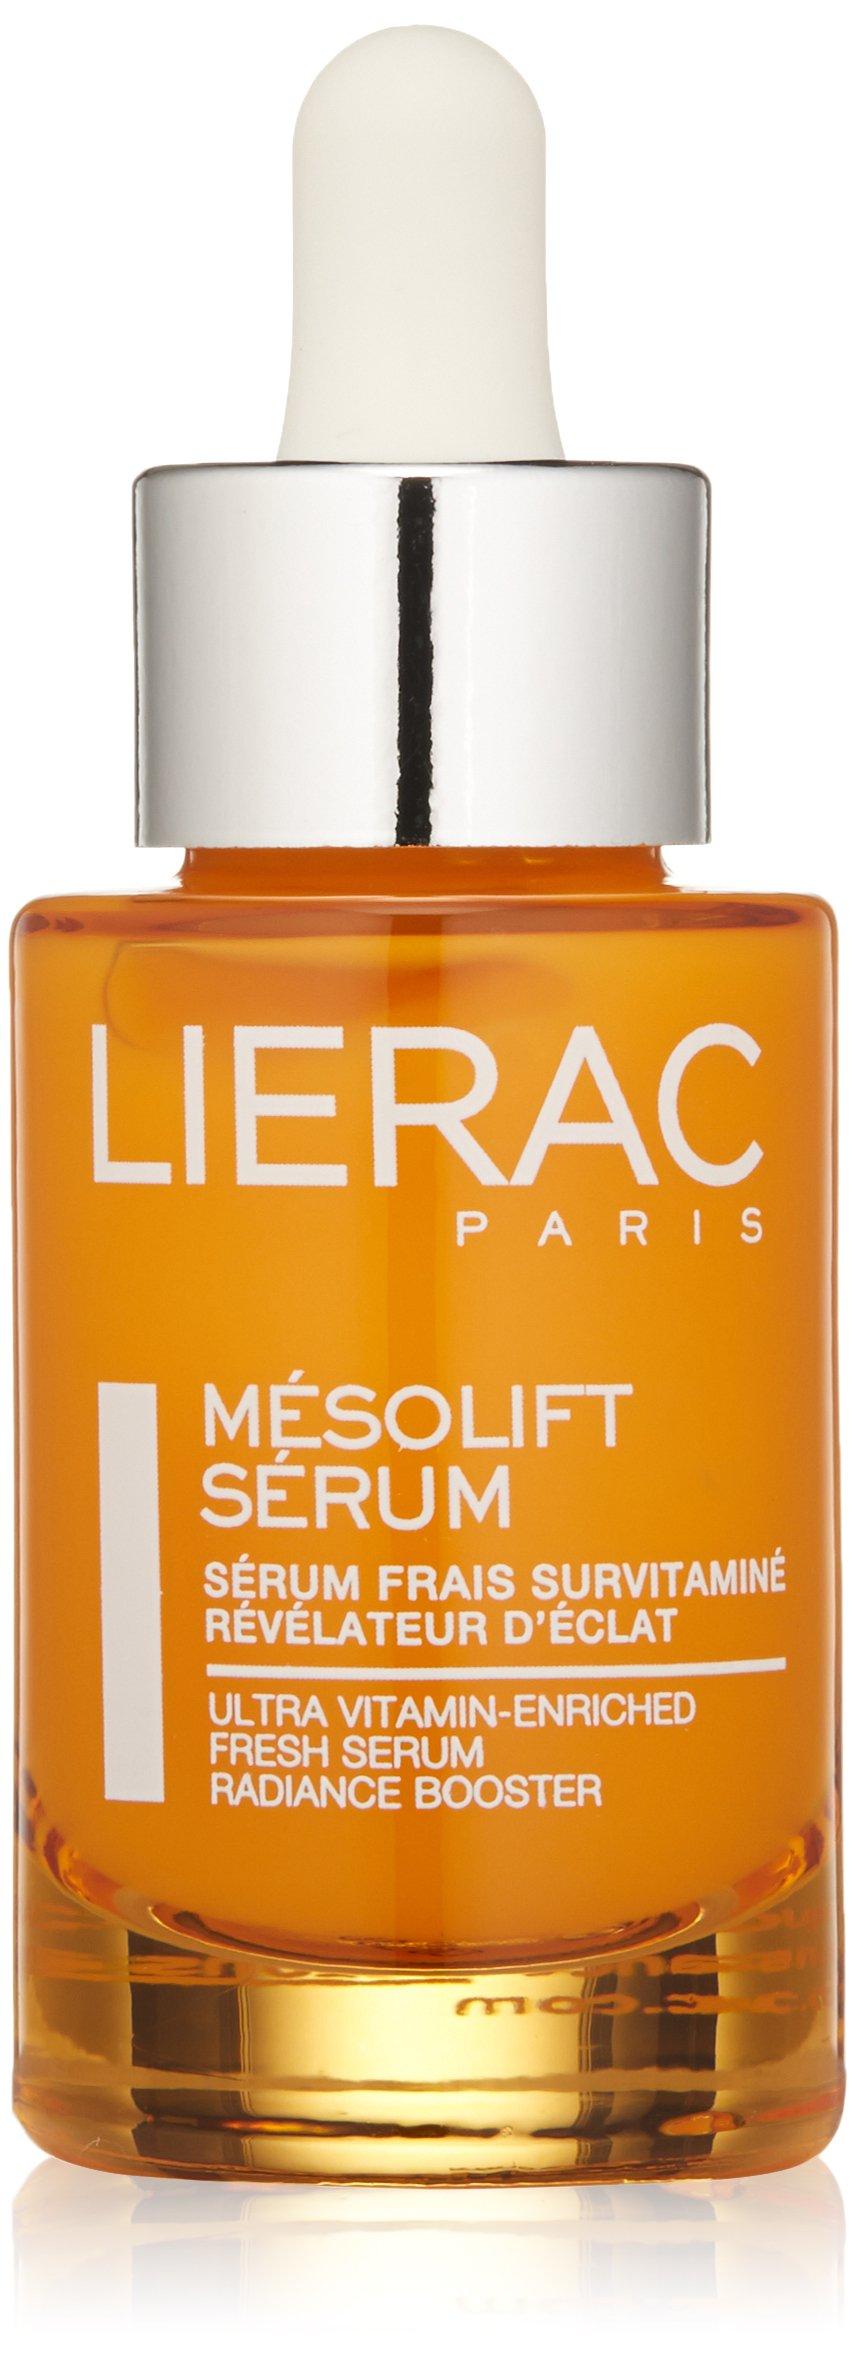 LIERAC Mesolift Serum, 1.1 Oz